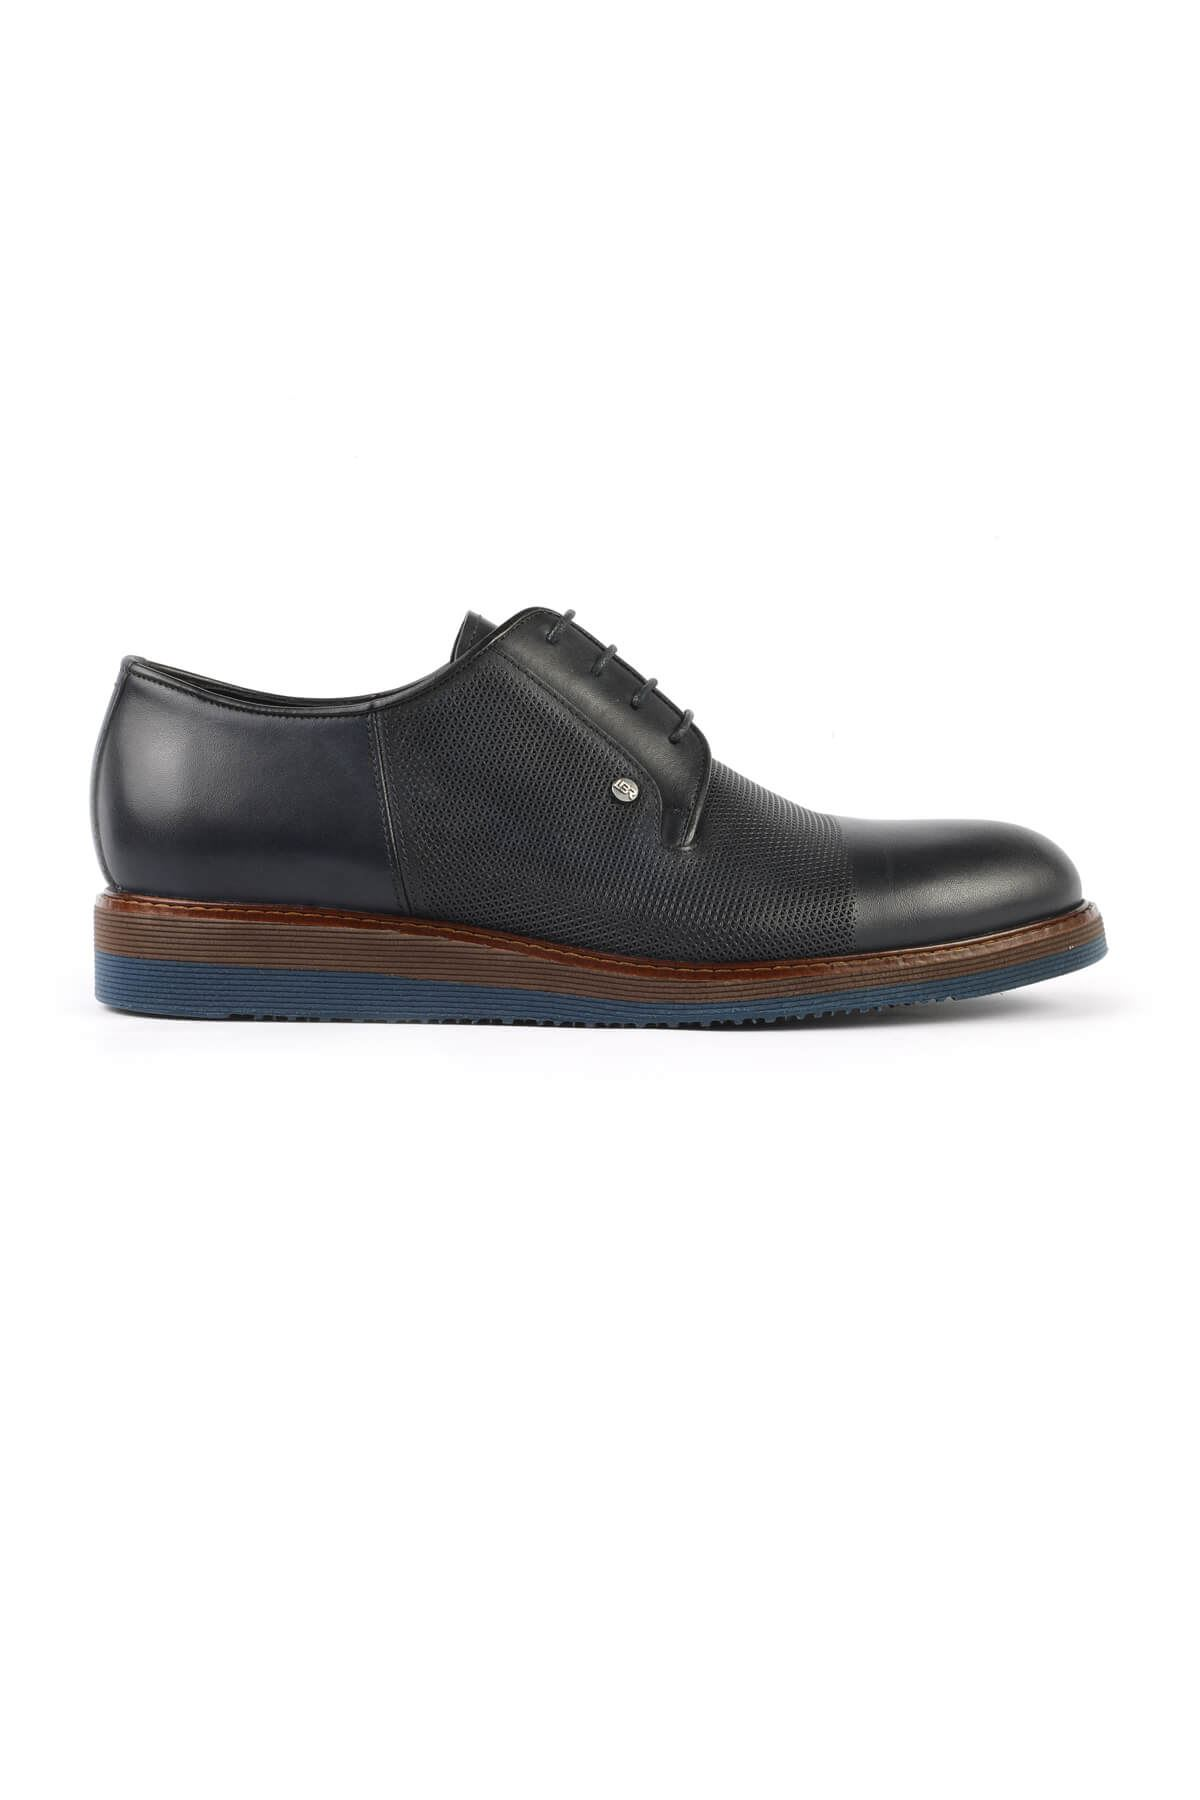 Libero 3052 Navy Blue Oxford Shoes